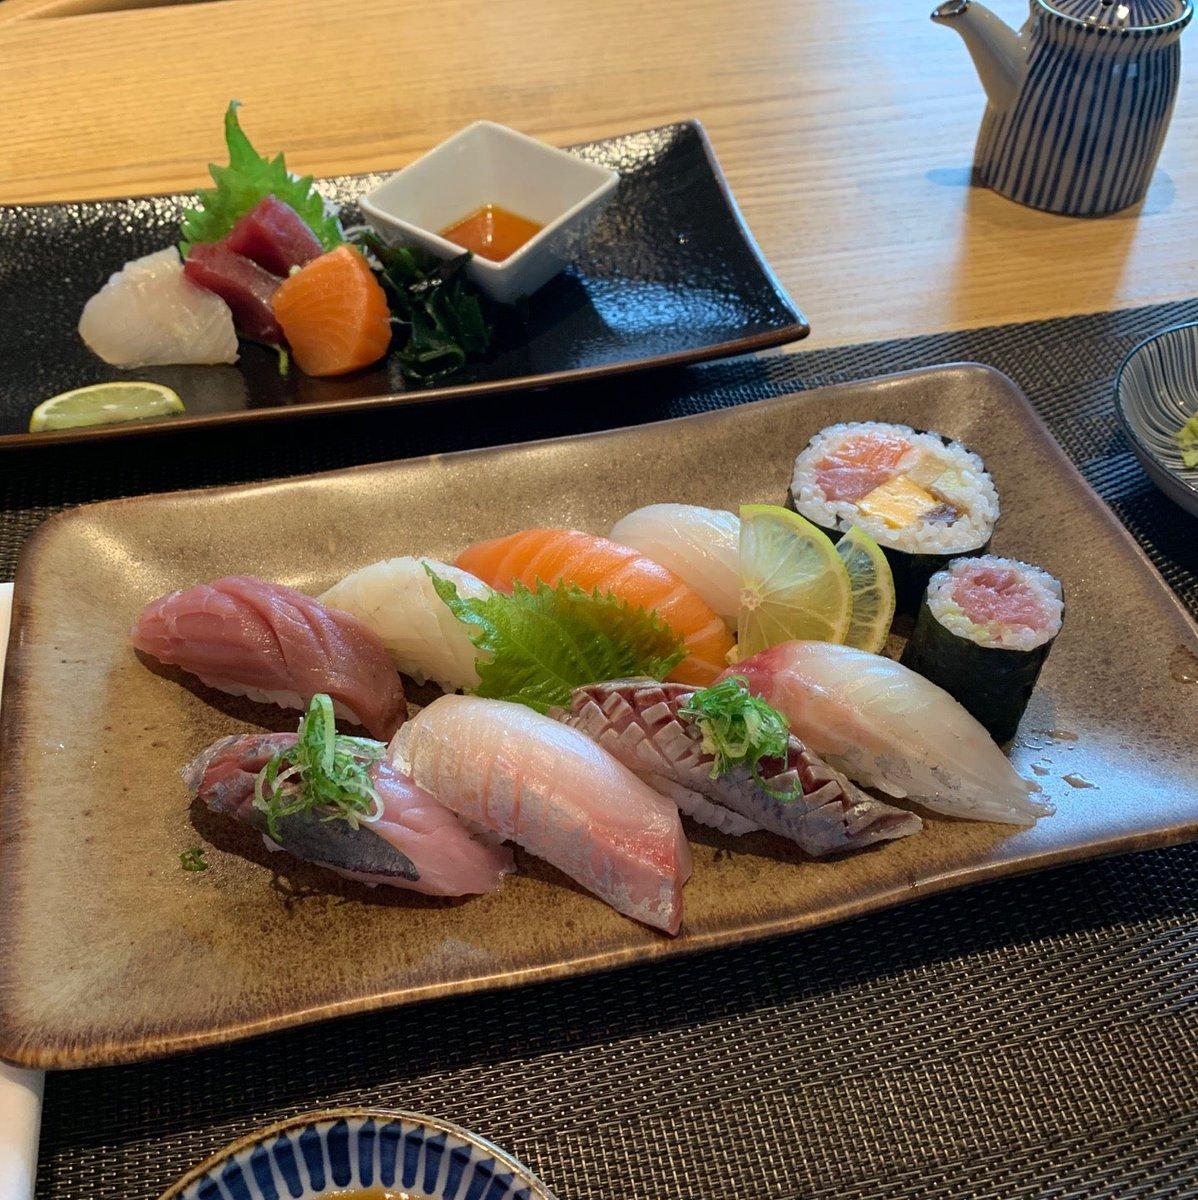 test ツイッターメディア - ポルトで日本食が恋しくなったら、おすすめのレストラン。 (@ Ichiban in Porto) https://t.co/mijE4hiZLT https://t.co/Bg93uu0CG1